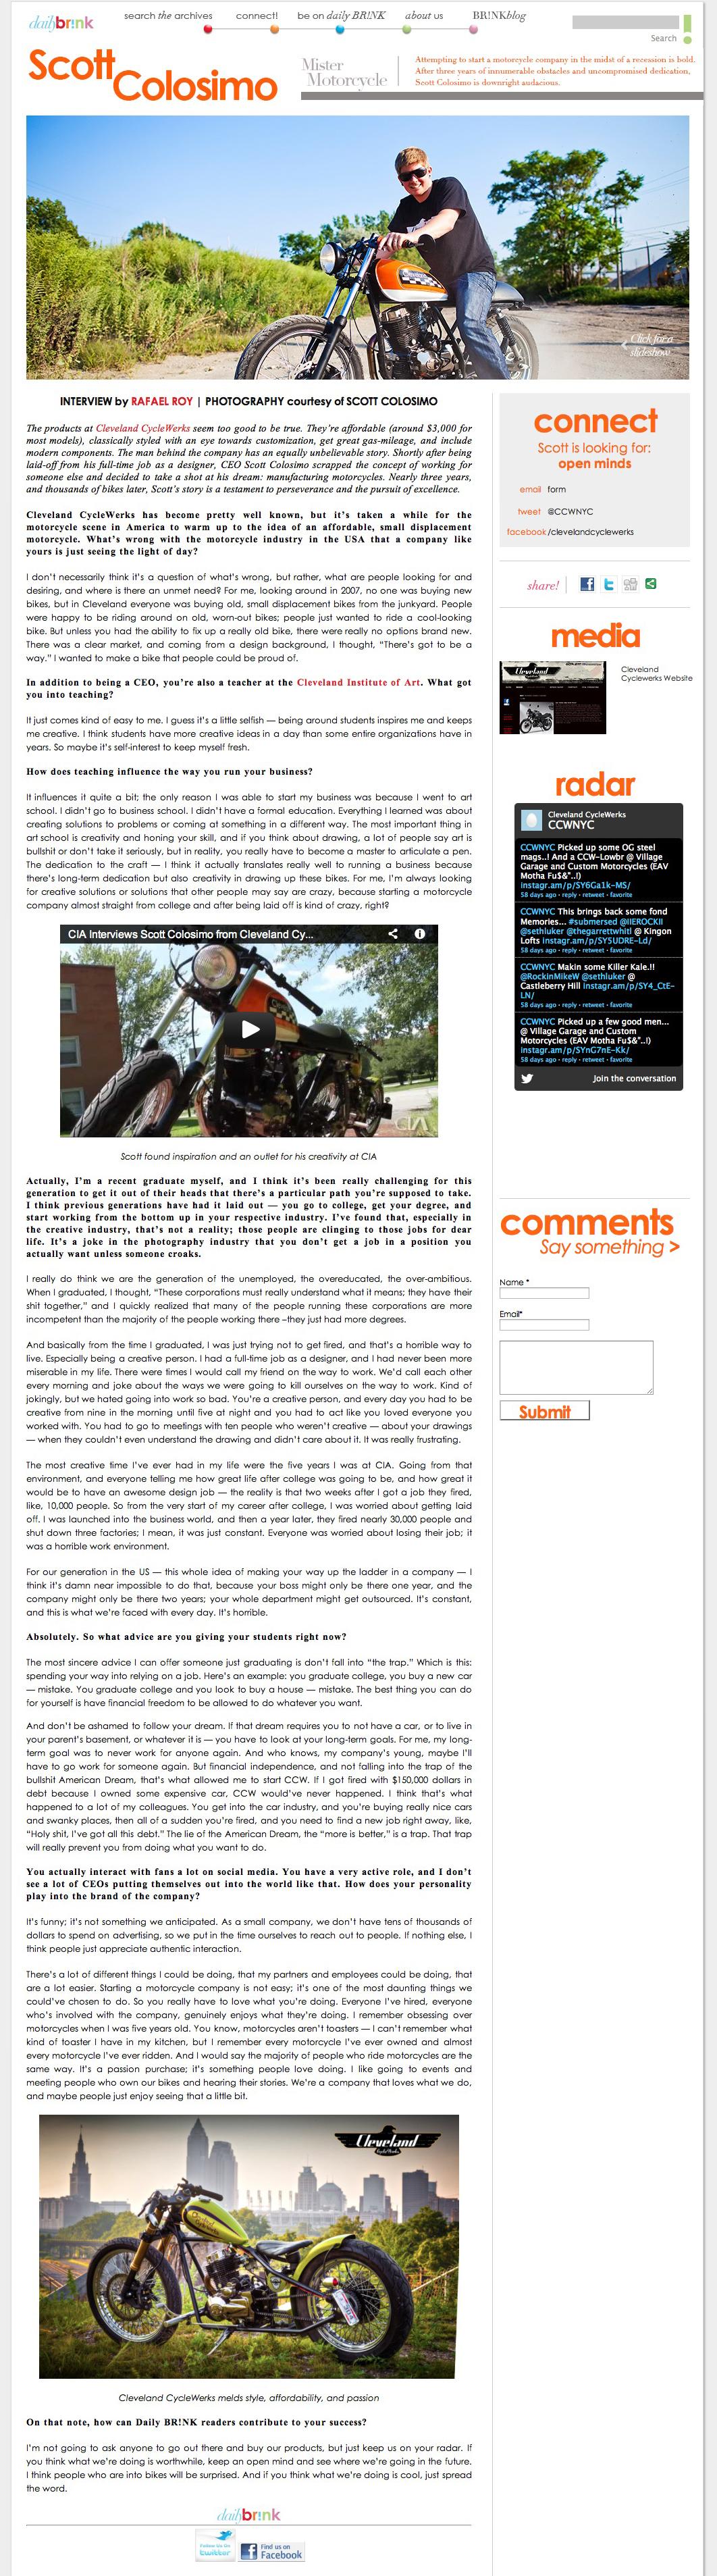 Daily-Brink_Scott-Colosimo-2012.jpg